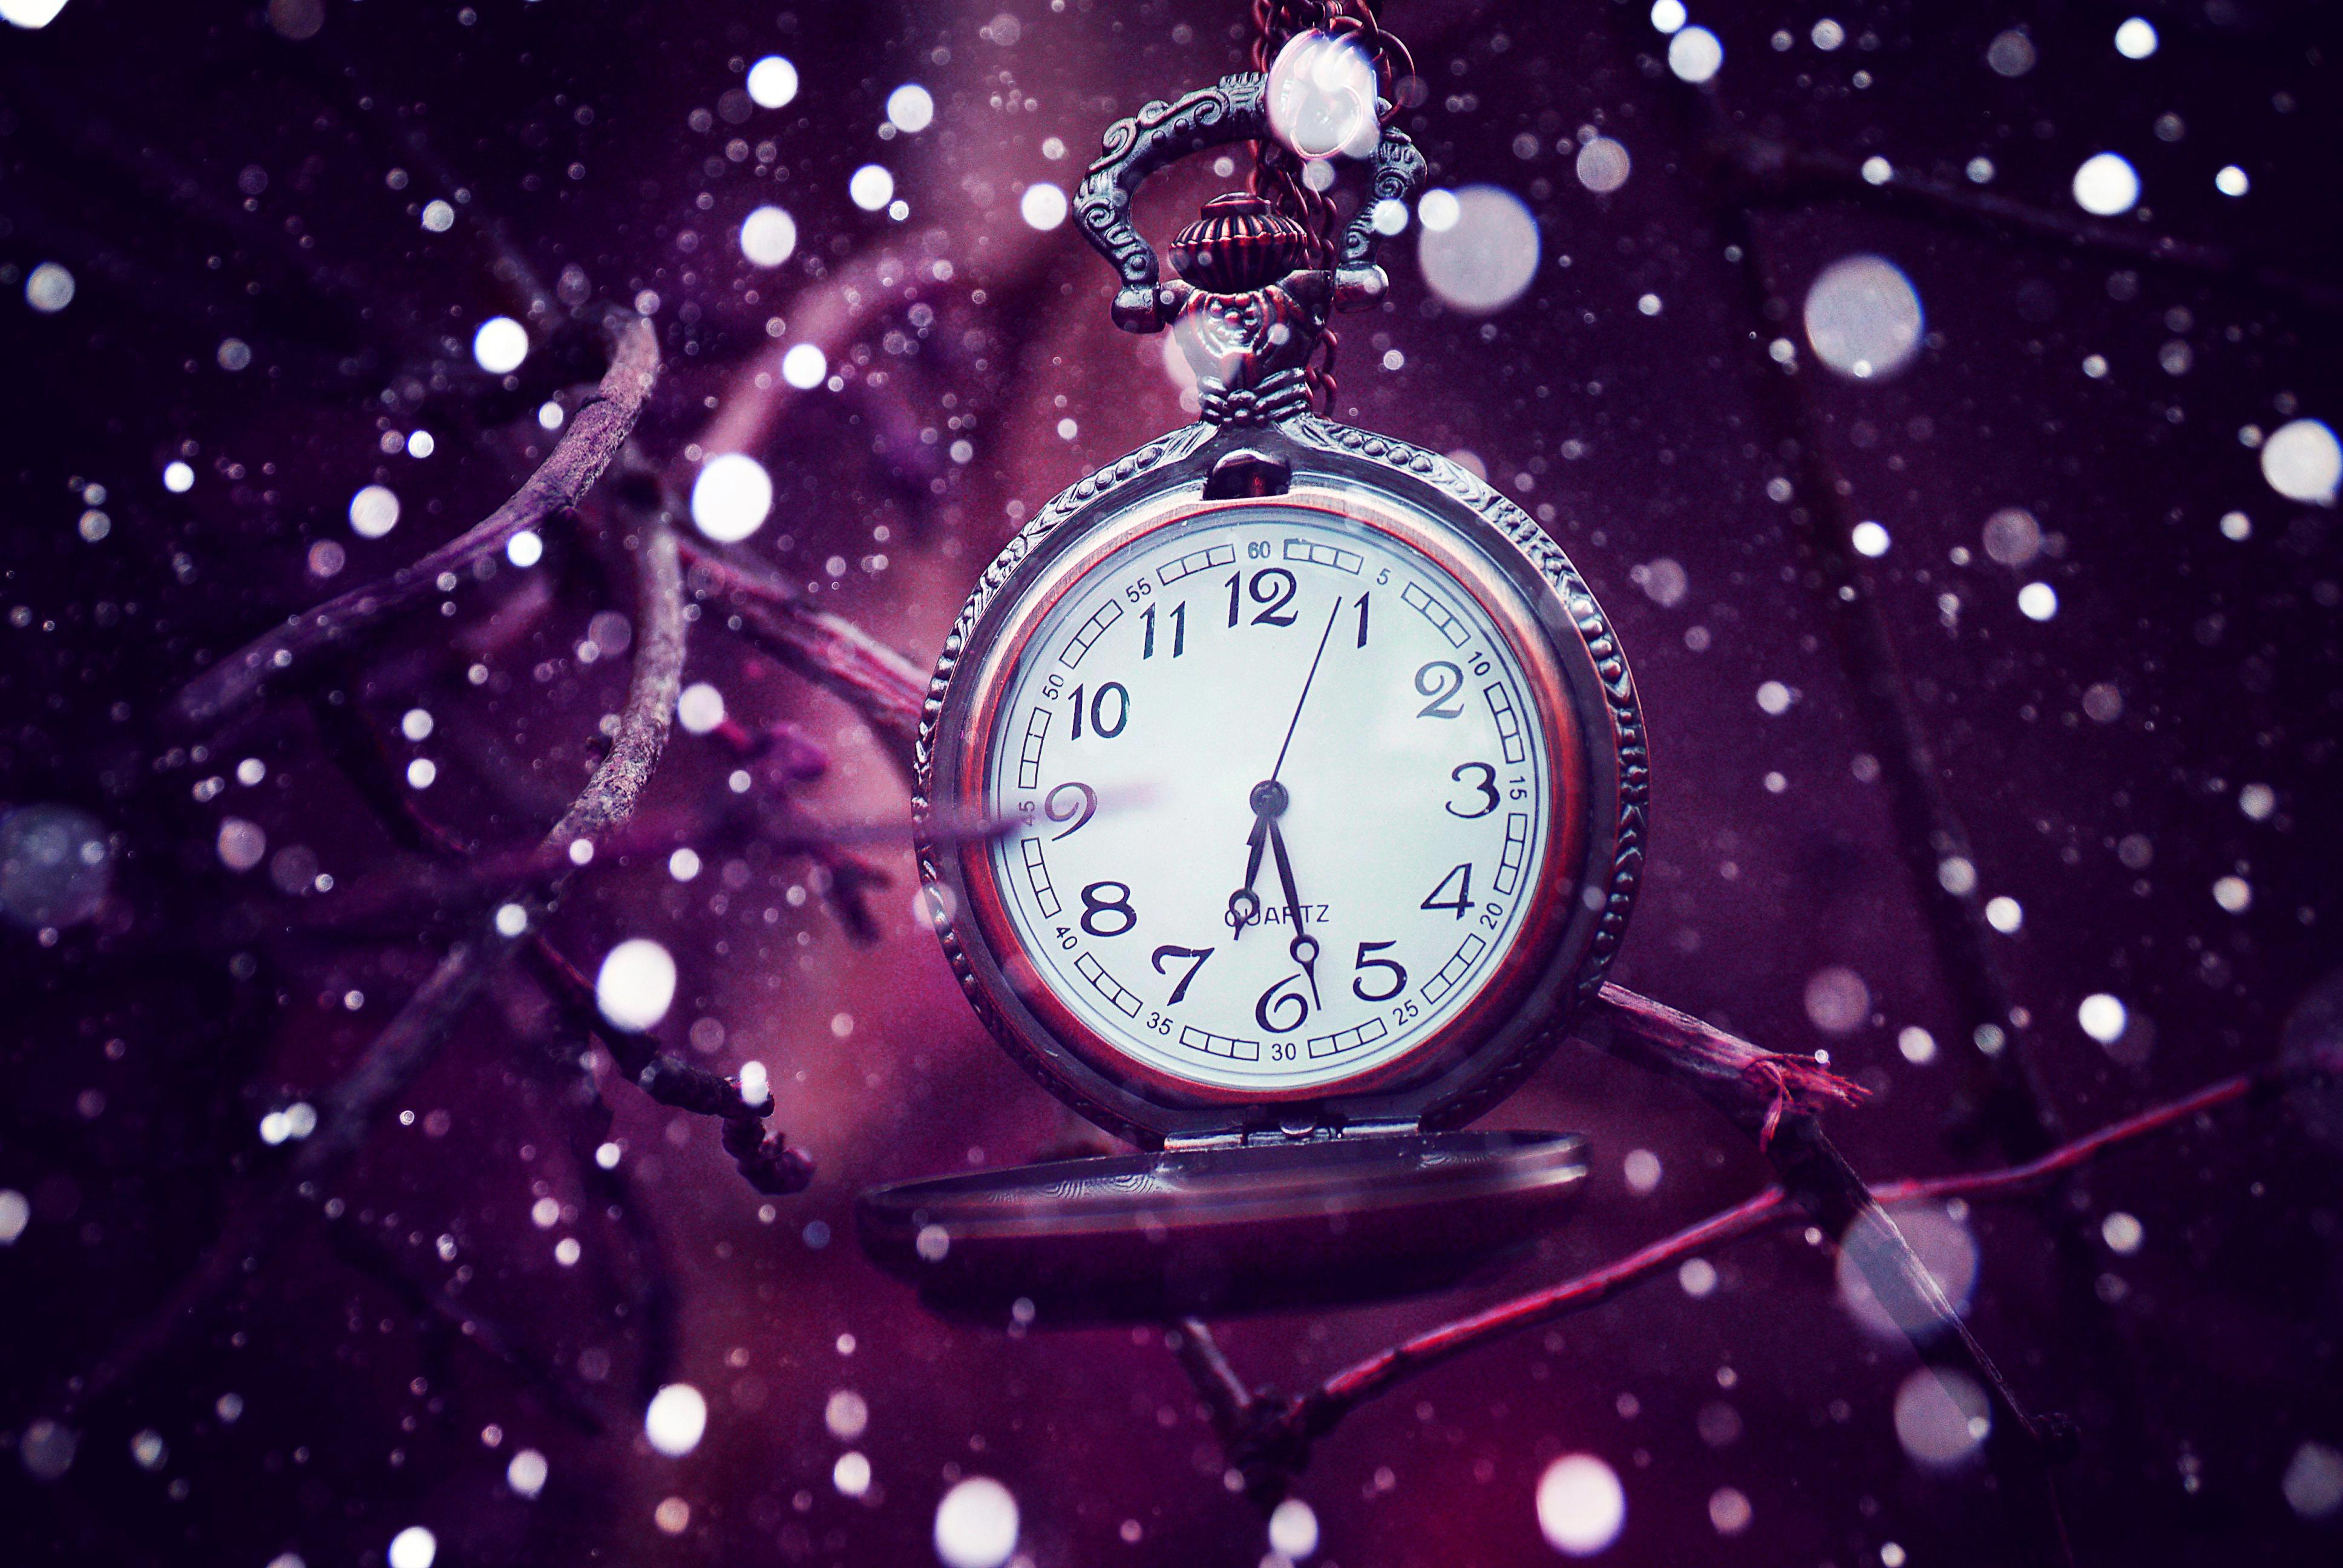 19 Hd Outstanding Clock Wallpapers Hdwallsource Com